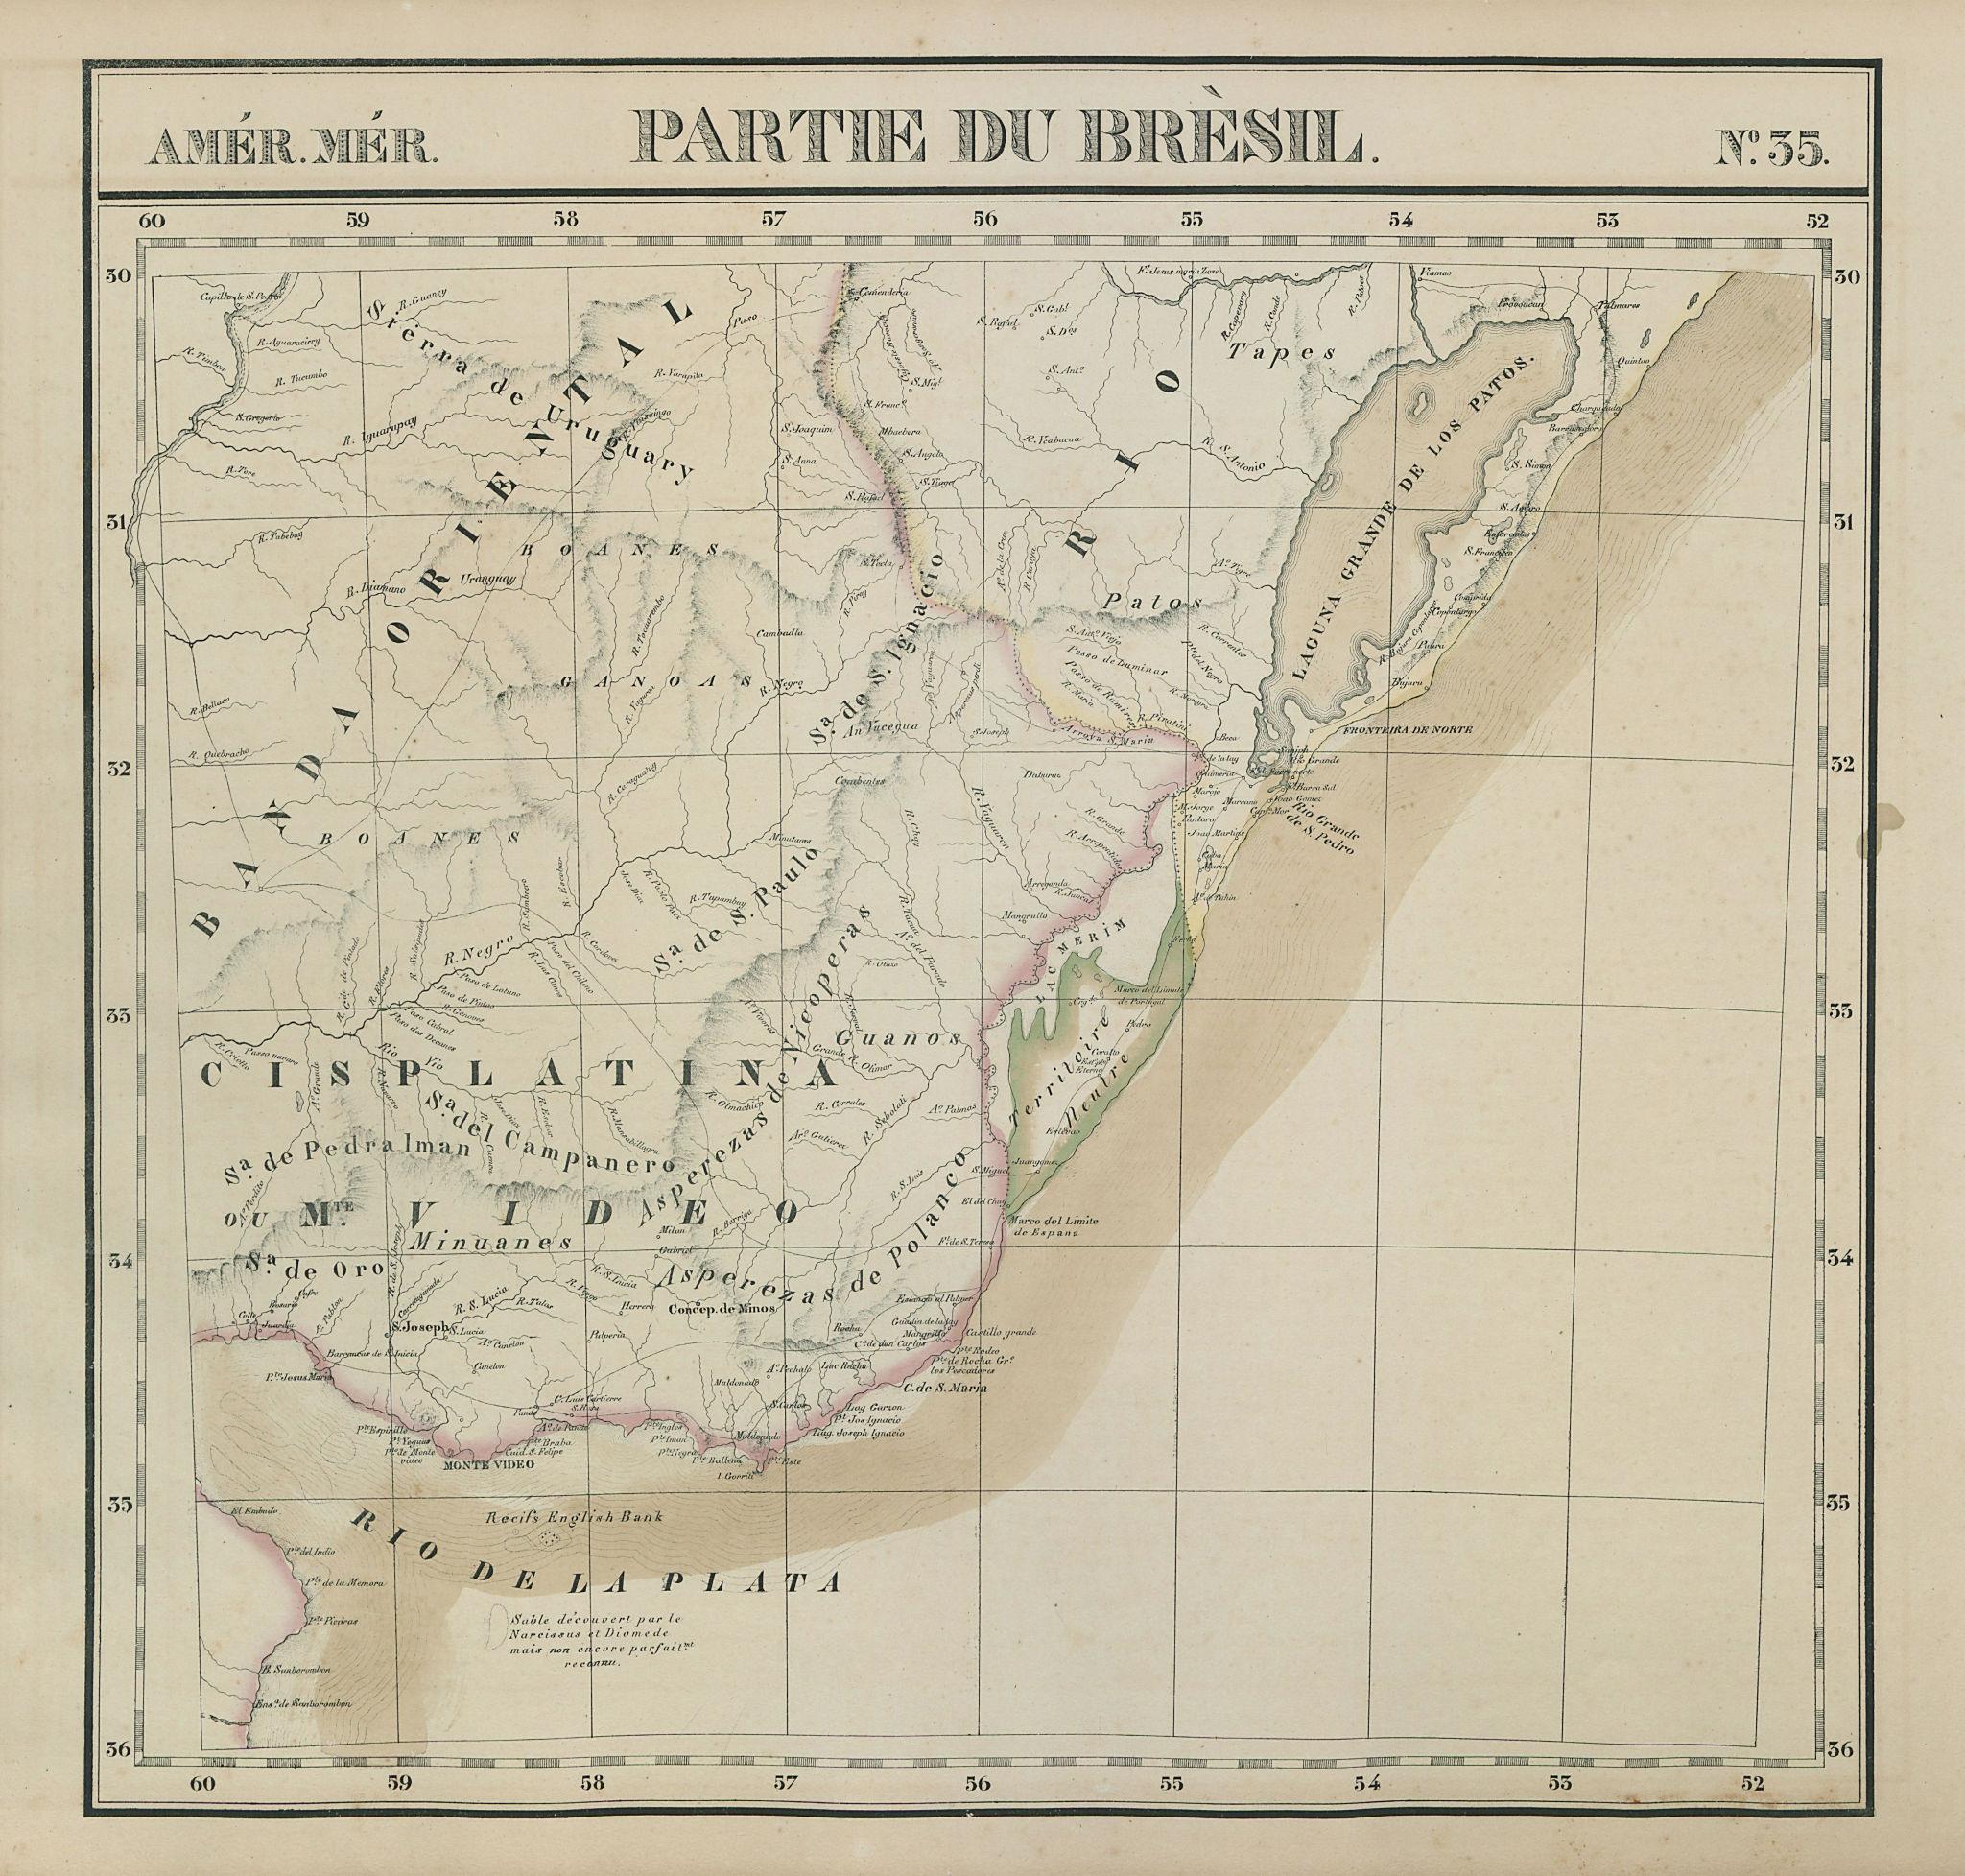 Amér. Mér. Brésil #35 Uruguay & Rio Grande do Sul, Brazil. VANDERMAELEN 1827 map